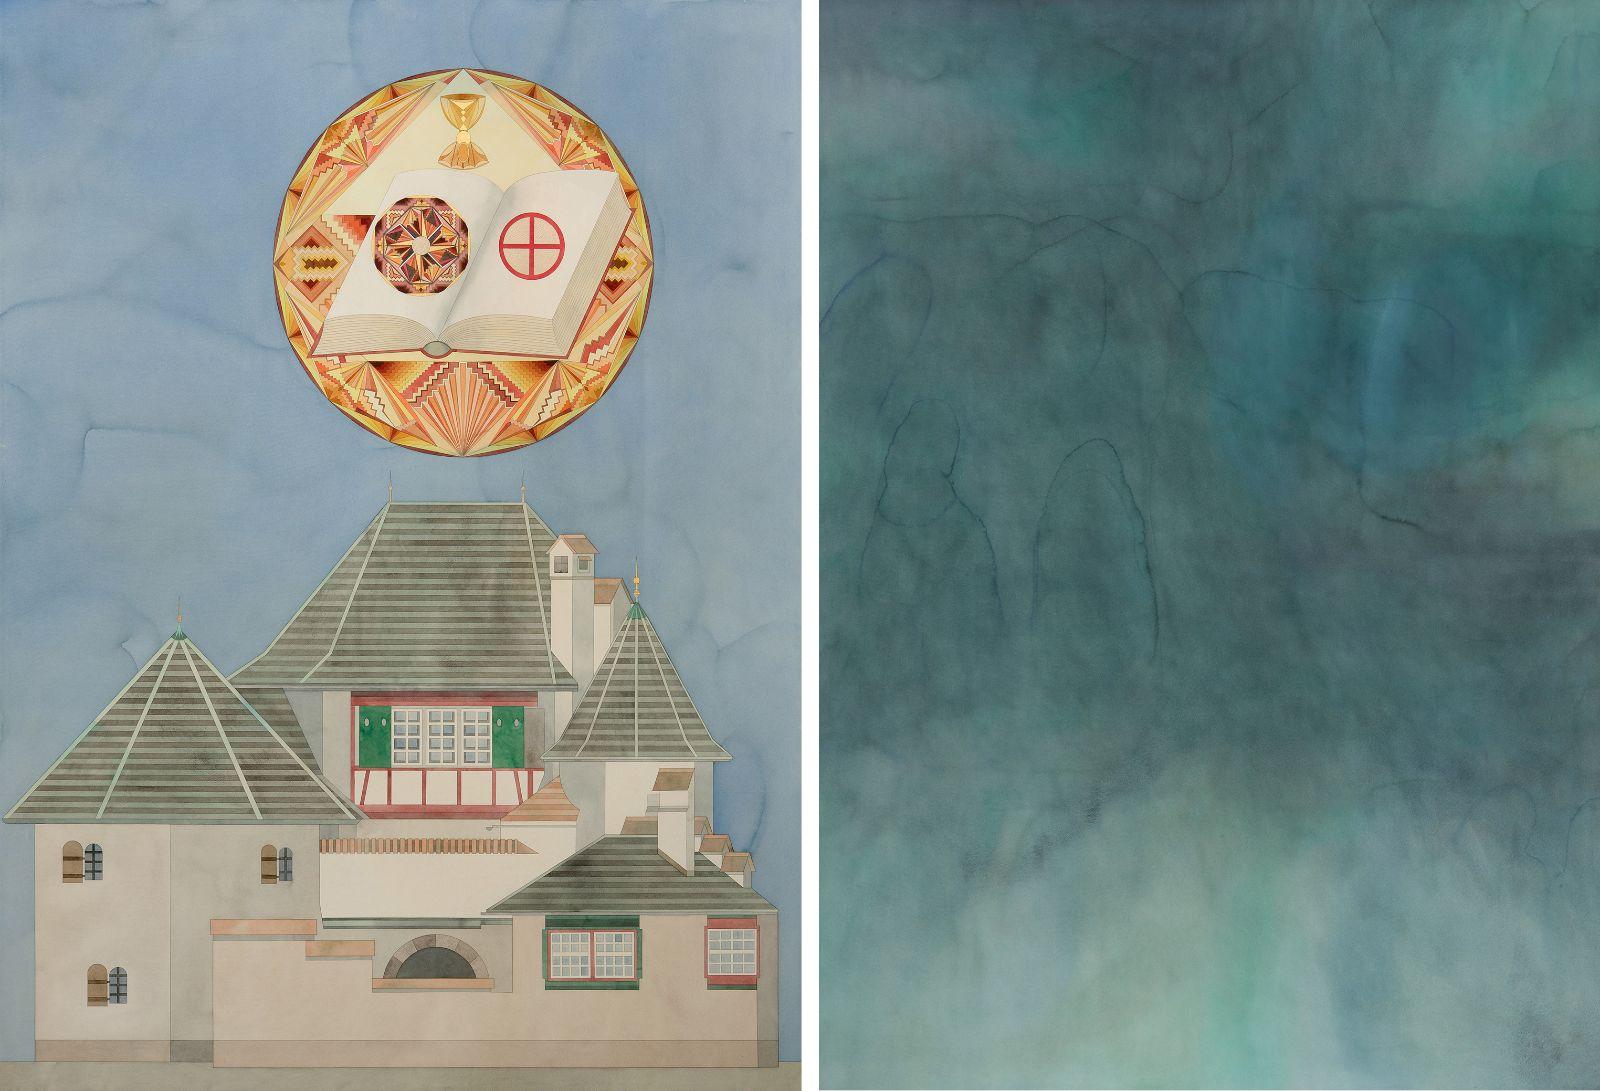 Haus Bollingen mit Gral / Der Traum VI, 2013, watercolour and gold-leaf on paper, 198 x 146 / 198 x 146 cm